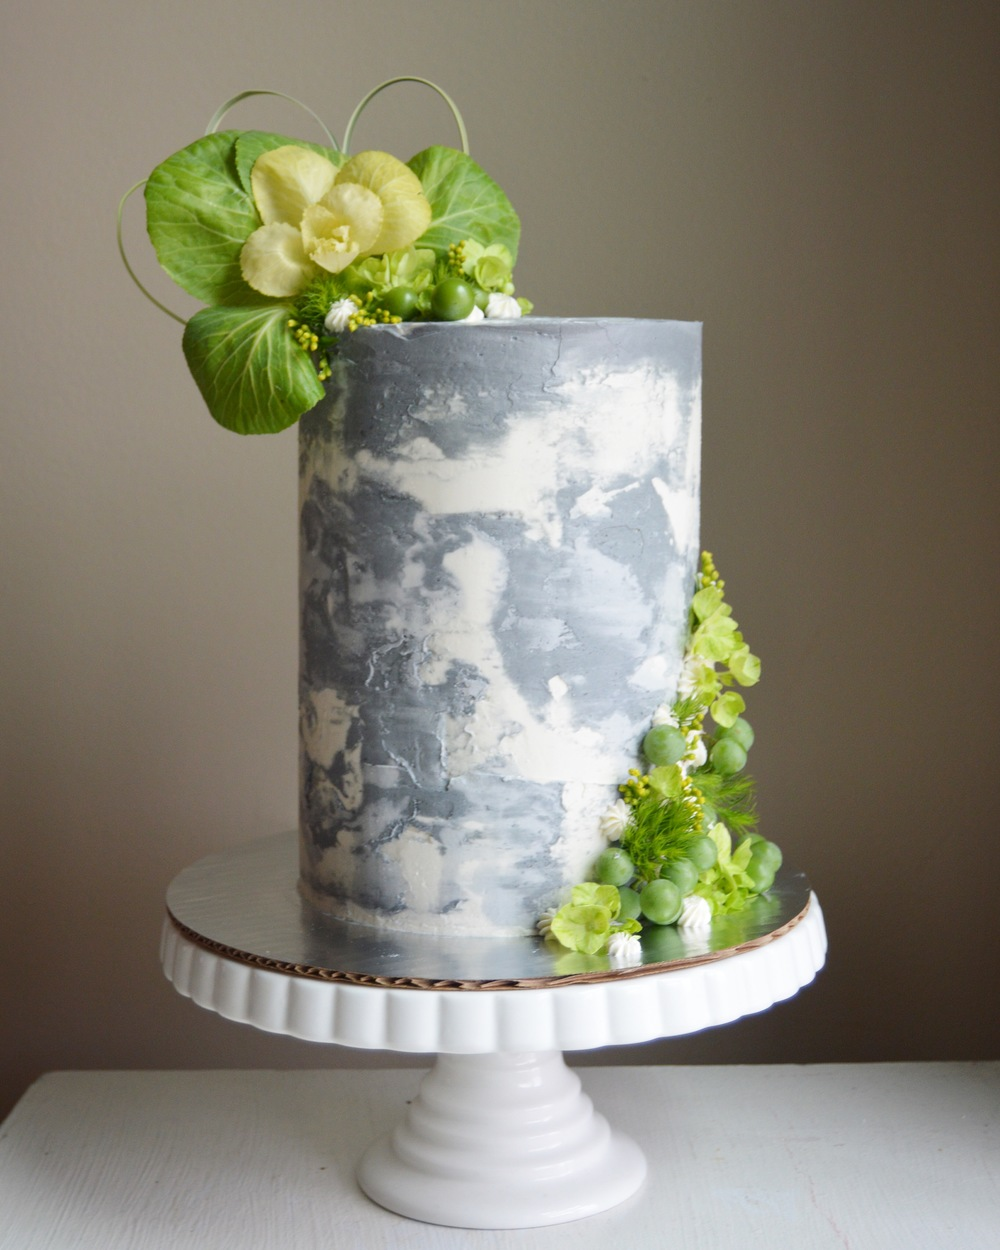 Bon Vivant Cakes